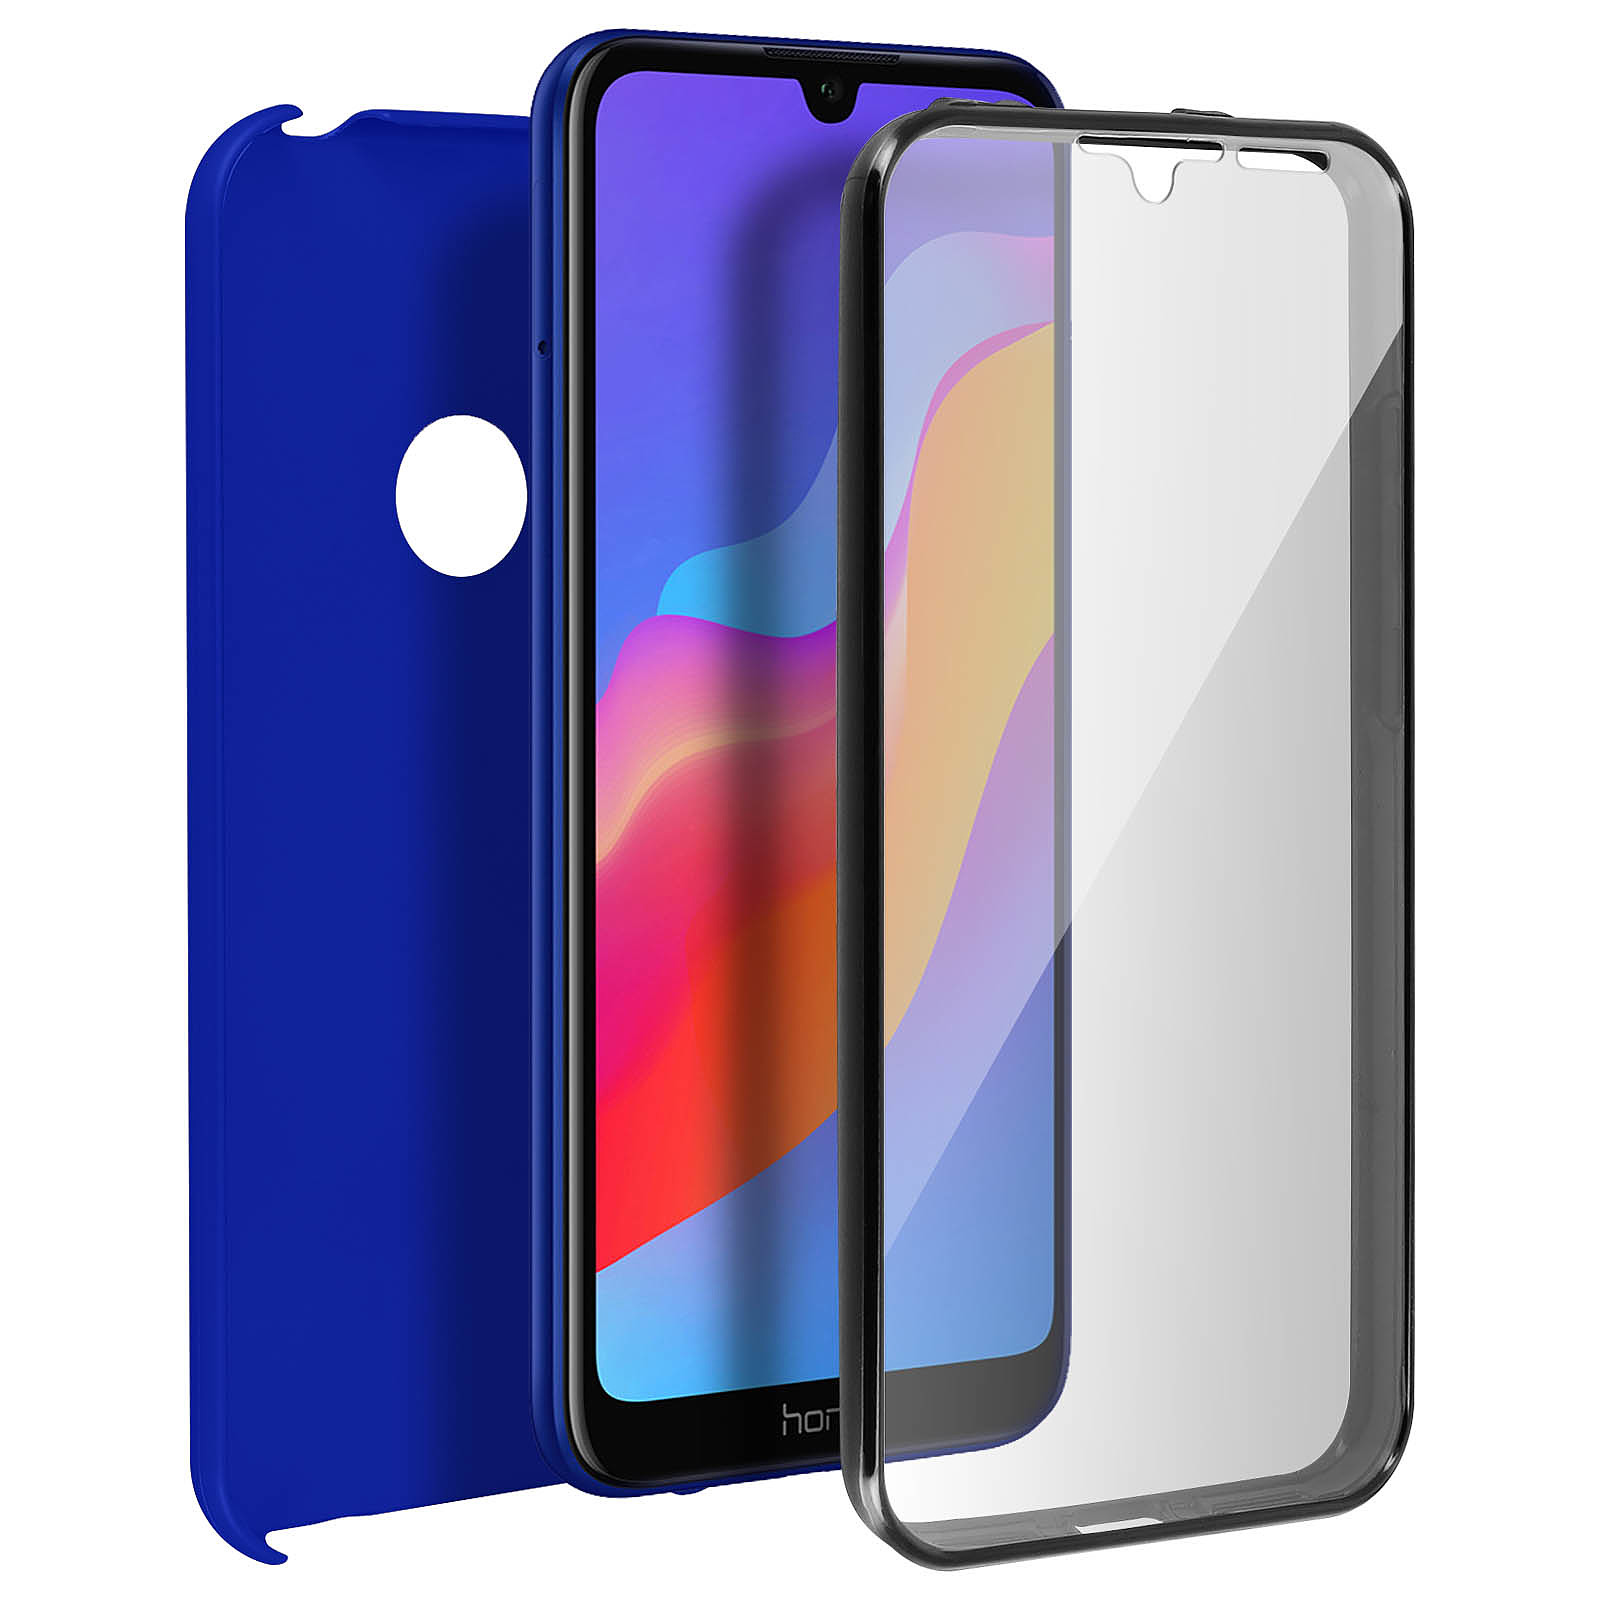 Avizar Coque Bleu pour Honor 8A , Huawei Y6 2019 , Huawei Y6S